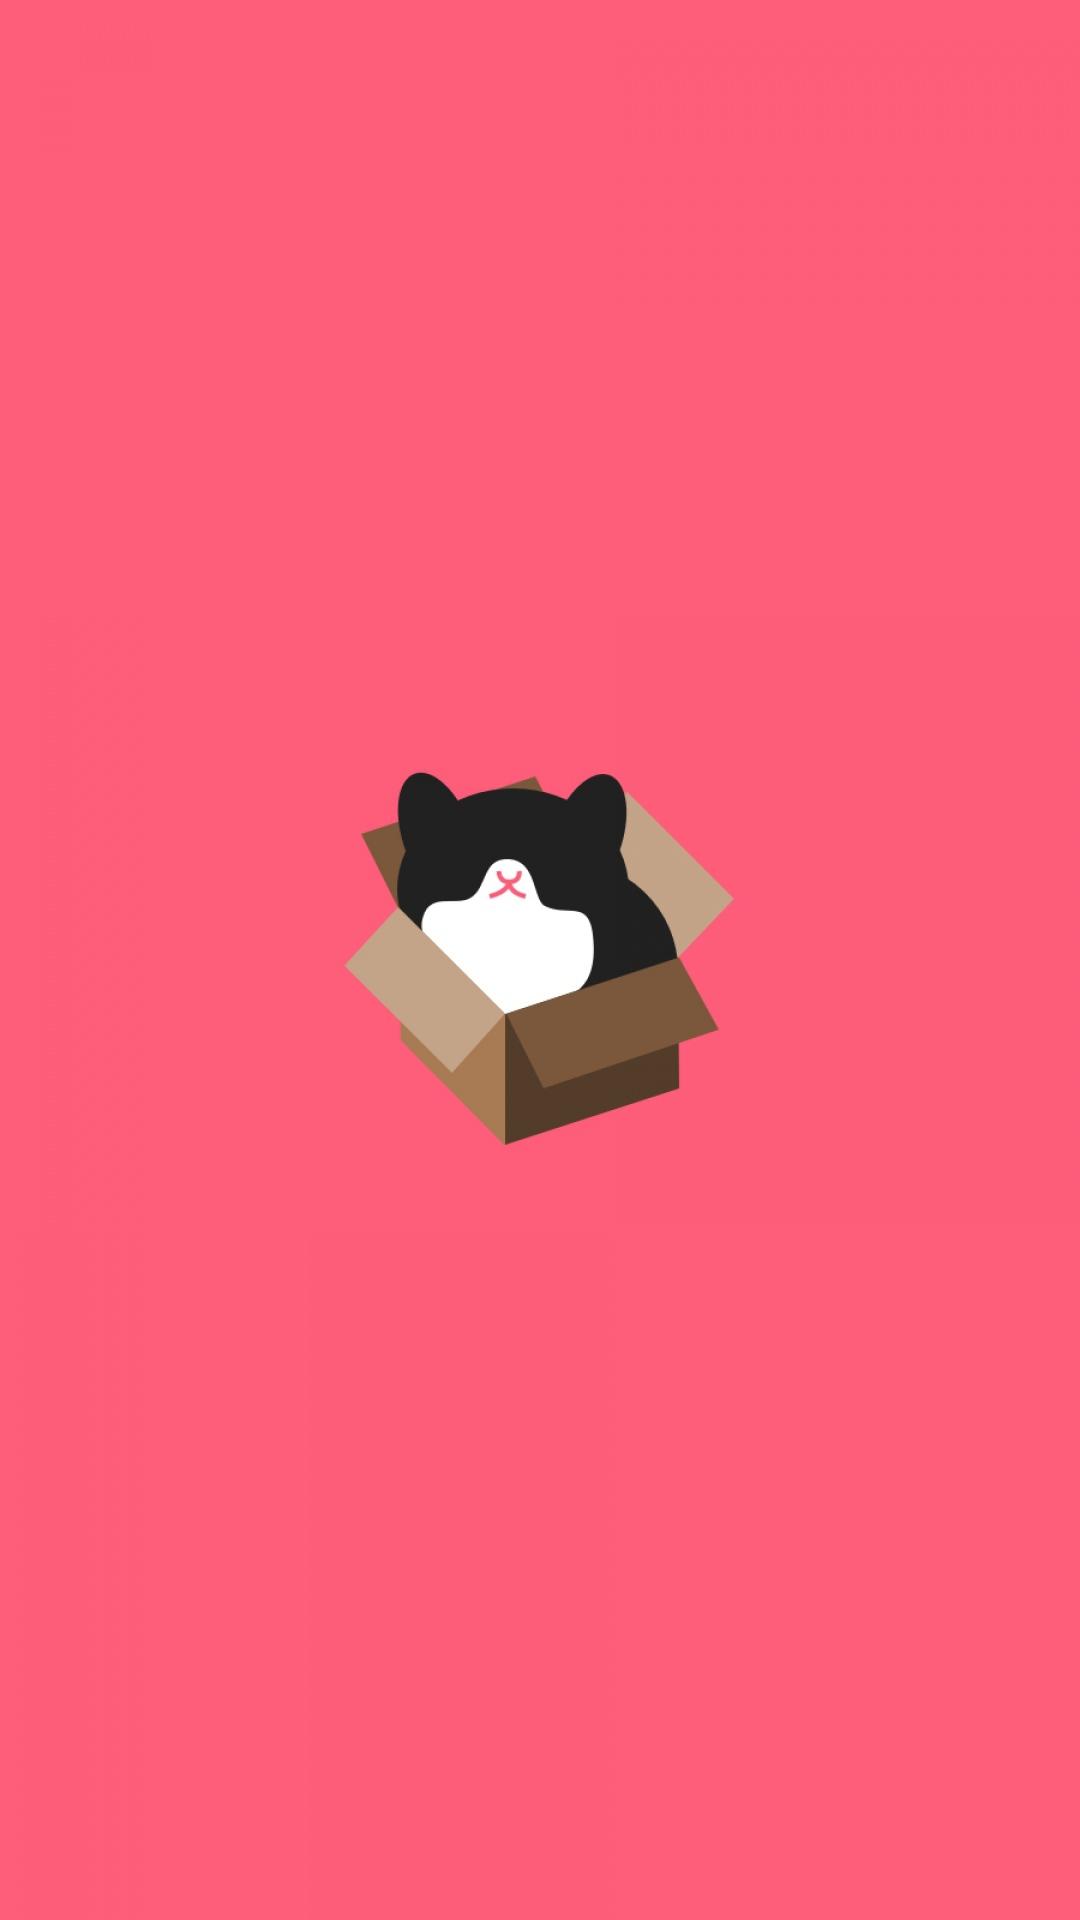 Cute Pink Cat Wallpapers Minimalist Wallpapers For Iphone Pixelstalk Net